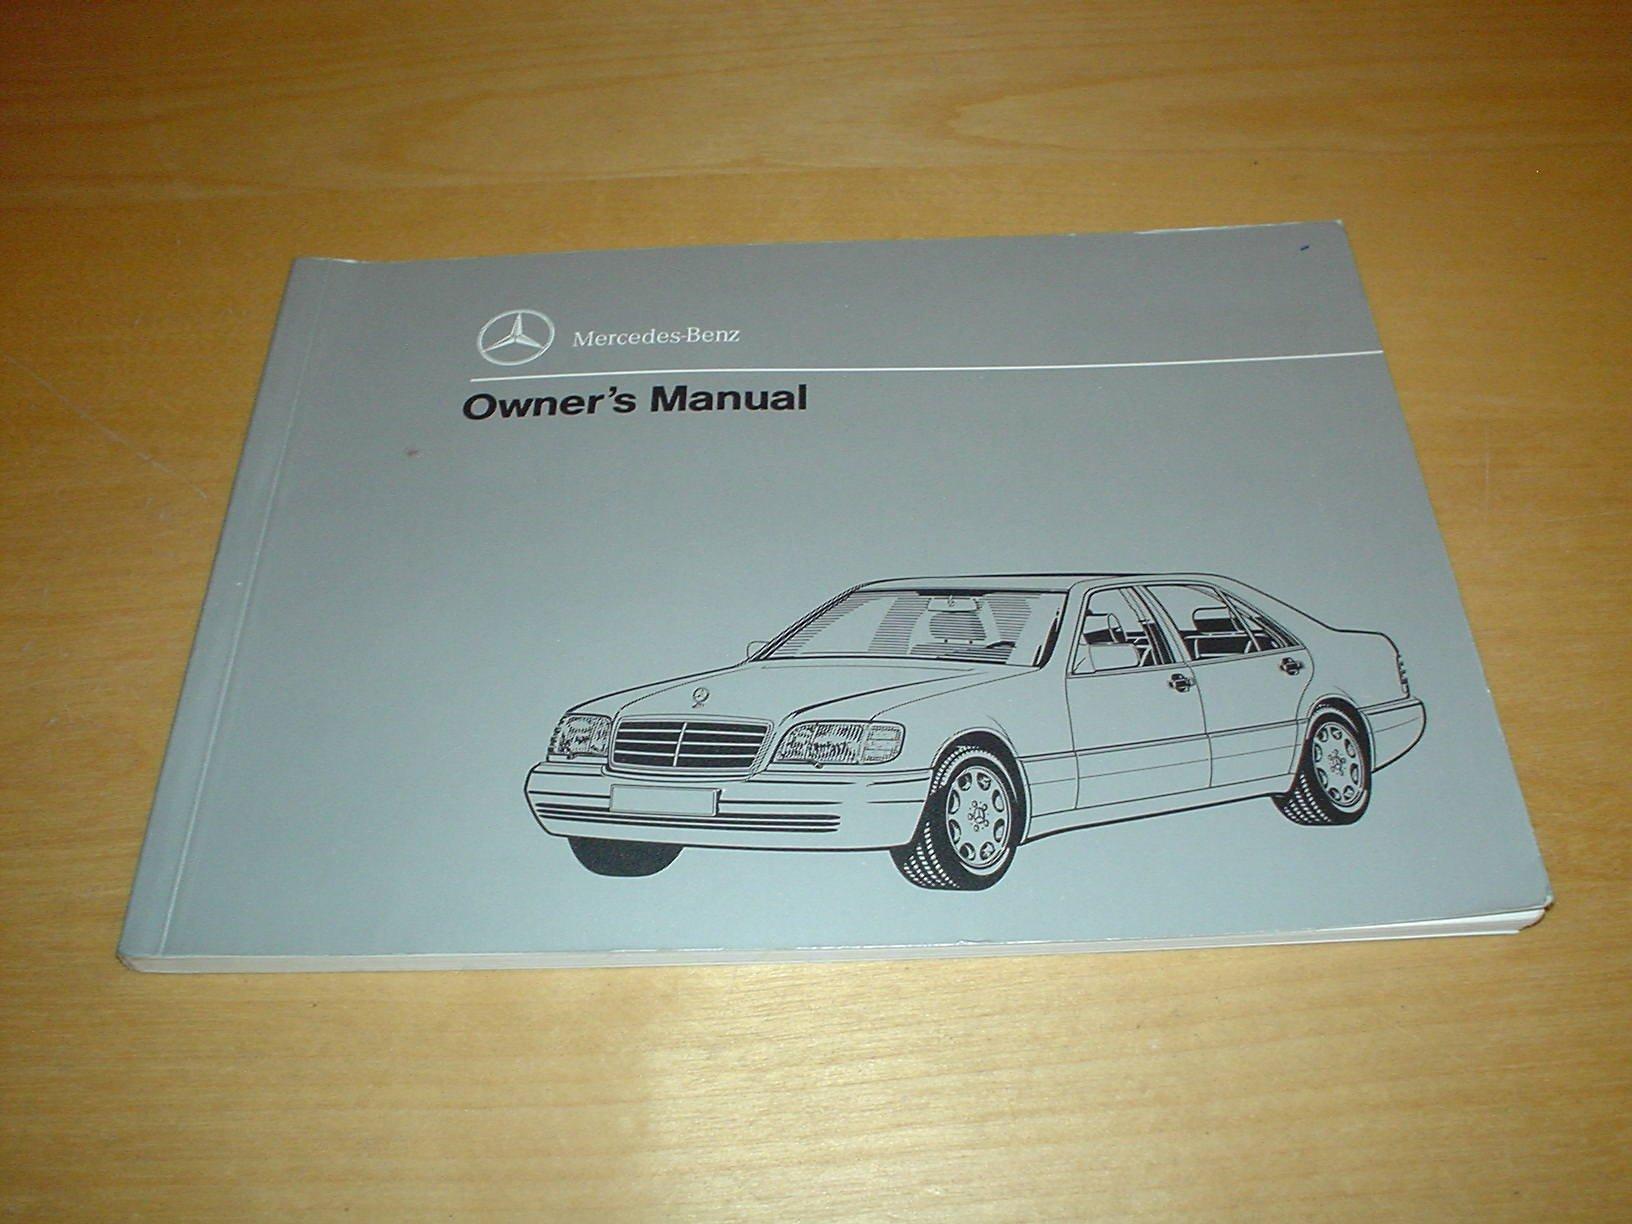 mercedes benz w140 s class owners manual handbook 1991 1999 rh amazon co uk Mercedes W140 Diesel Mercedes W124